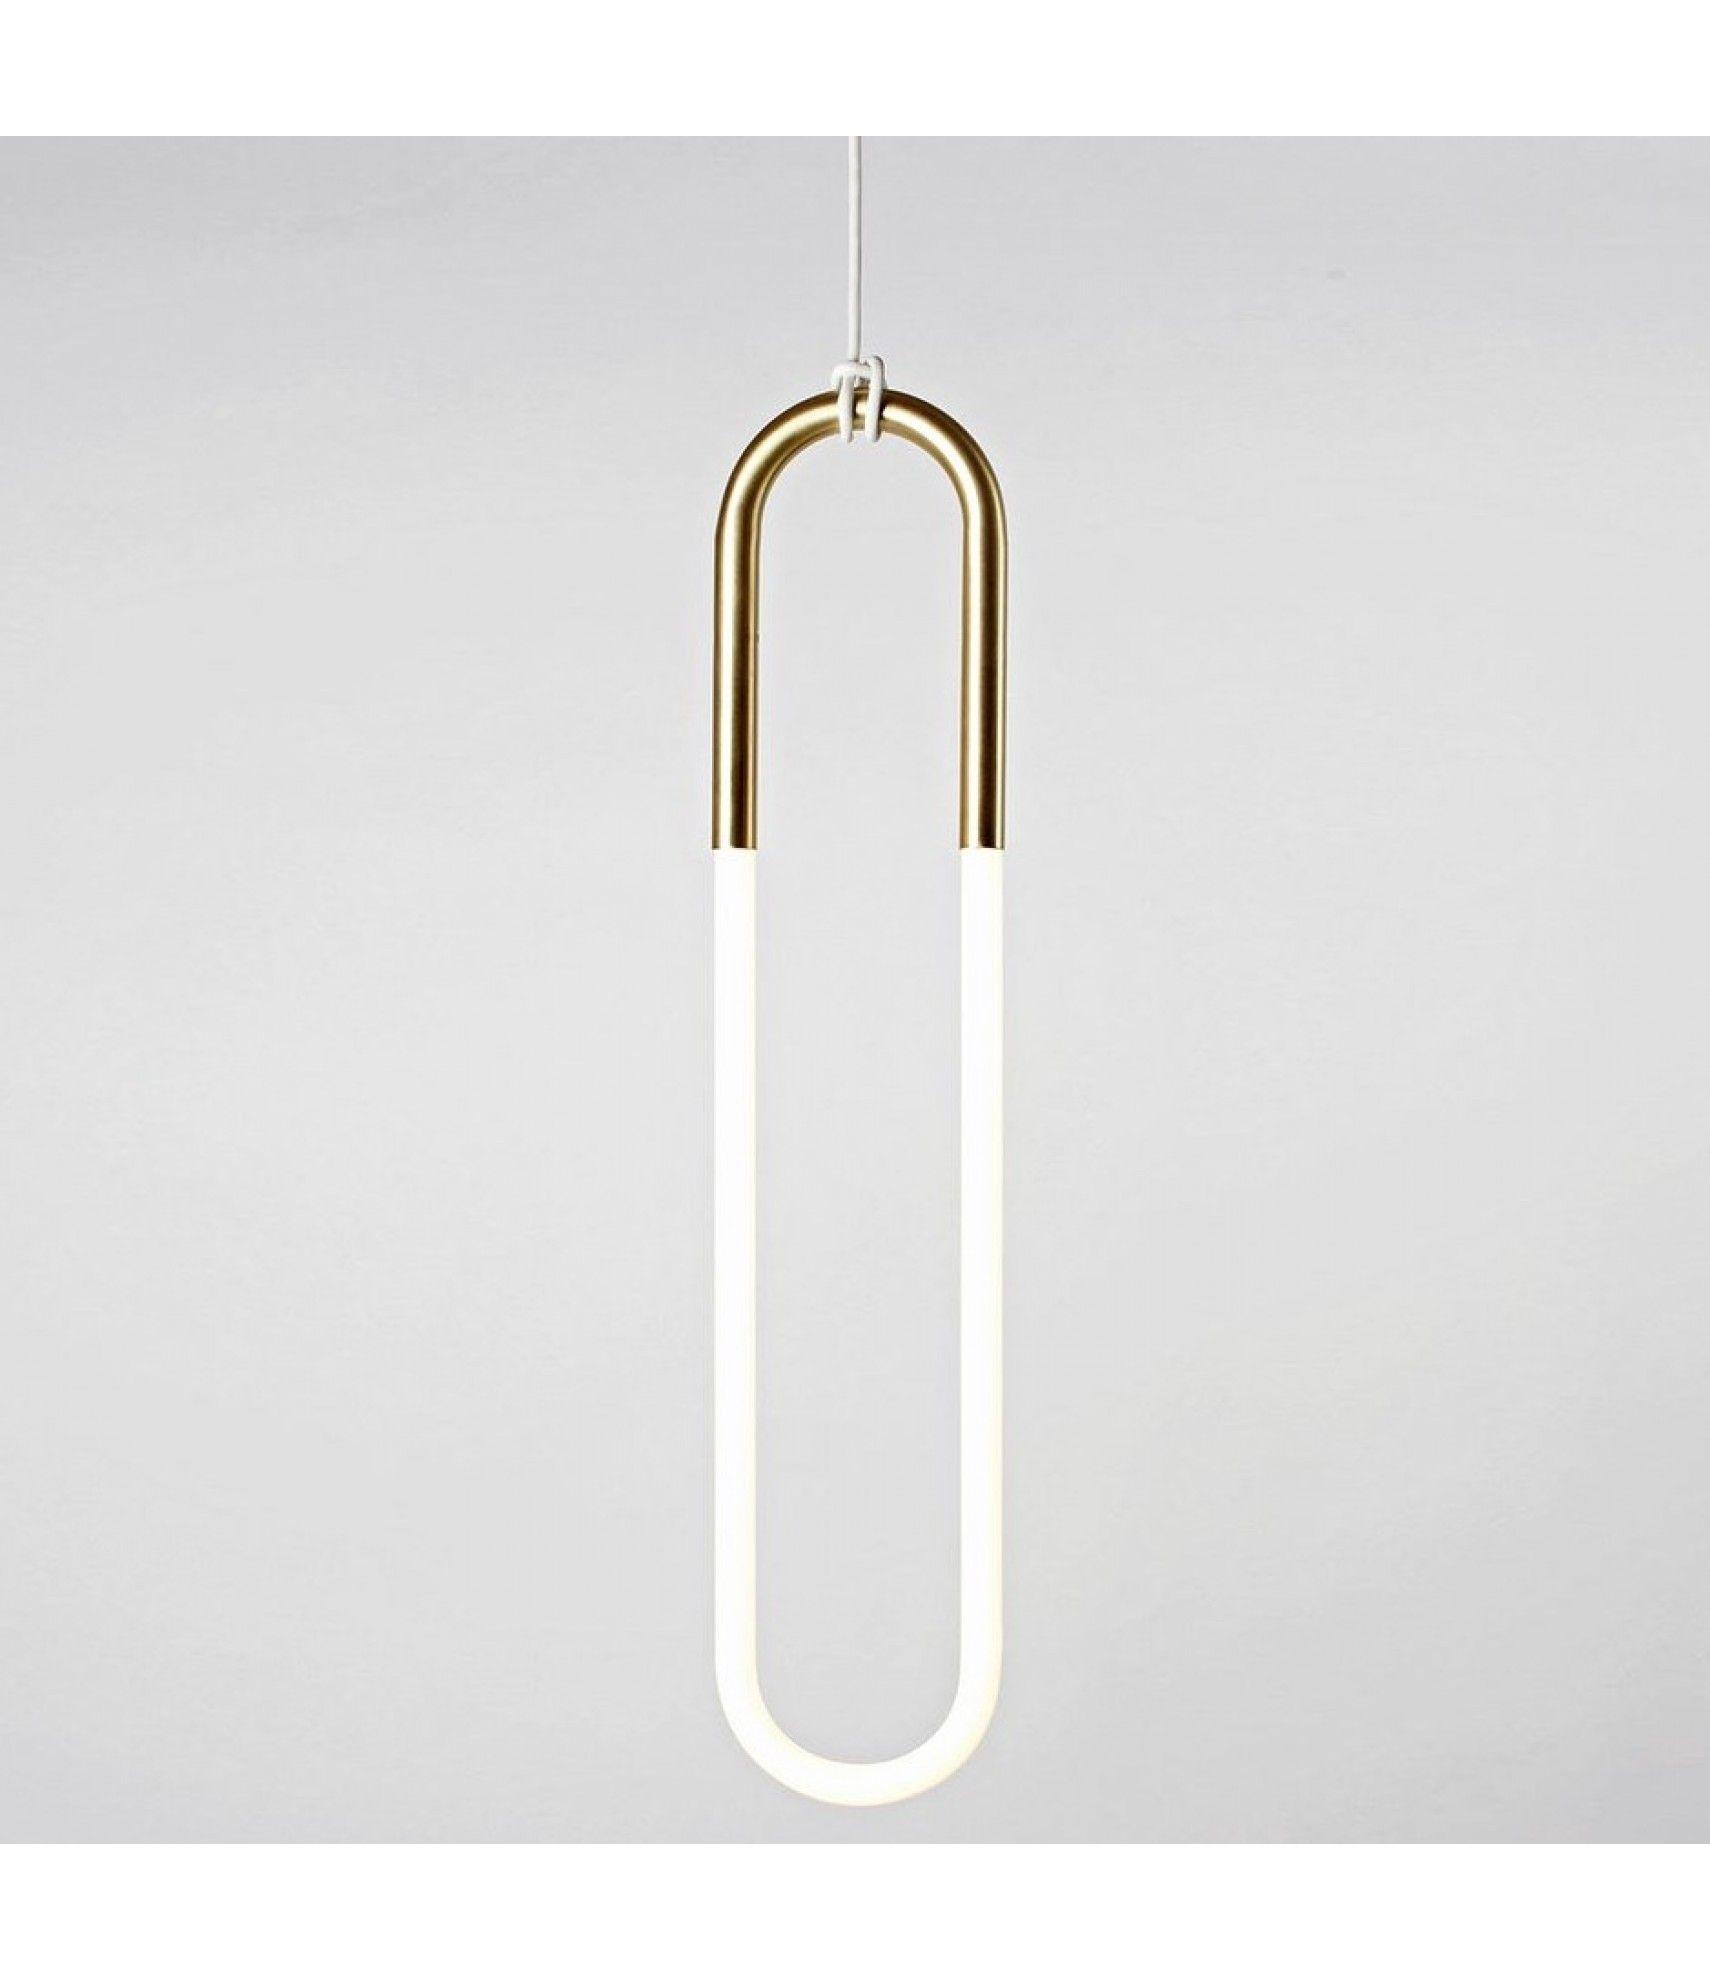 Replica Rudi Loop 01 Pendant Lamp 380 Lucretia Light